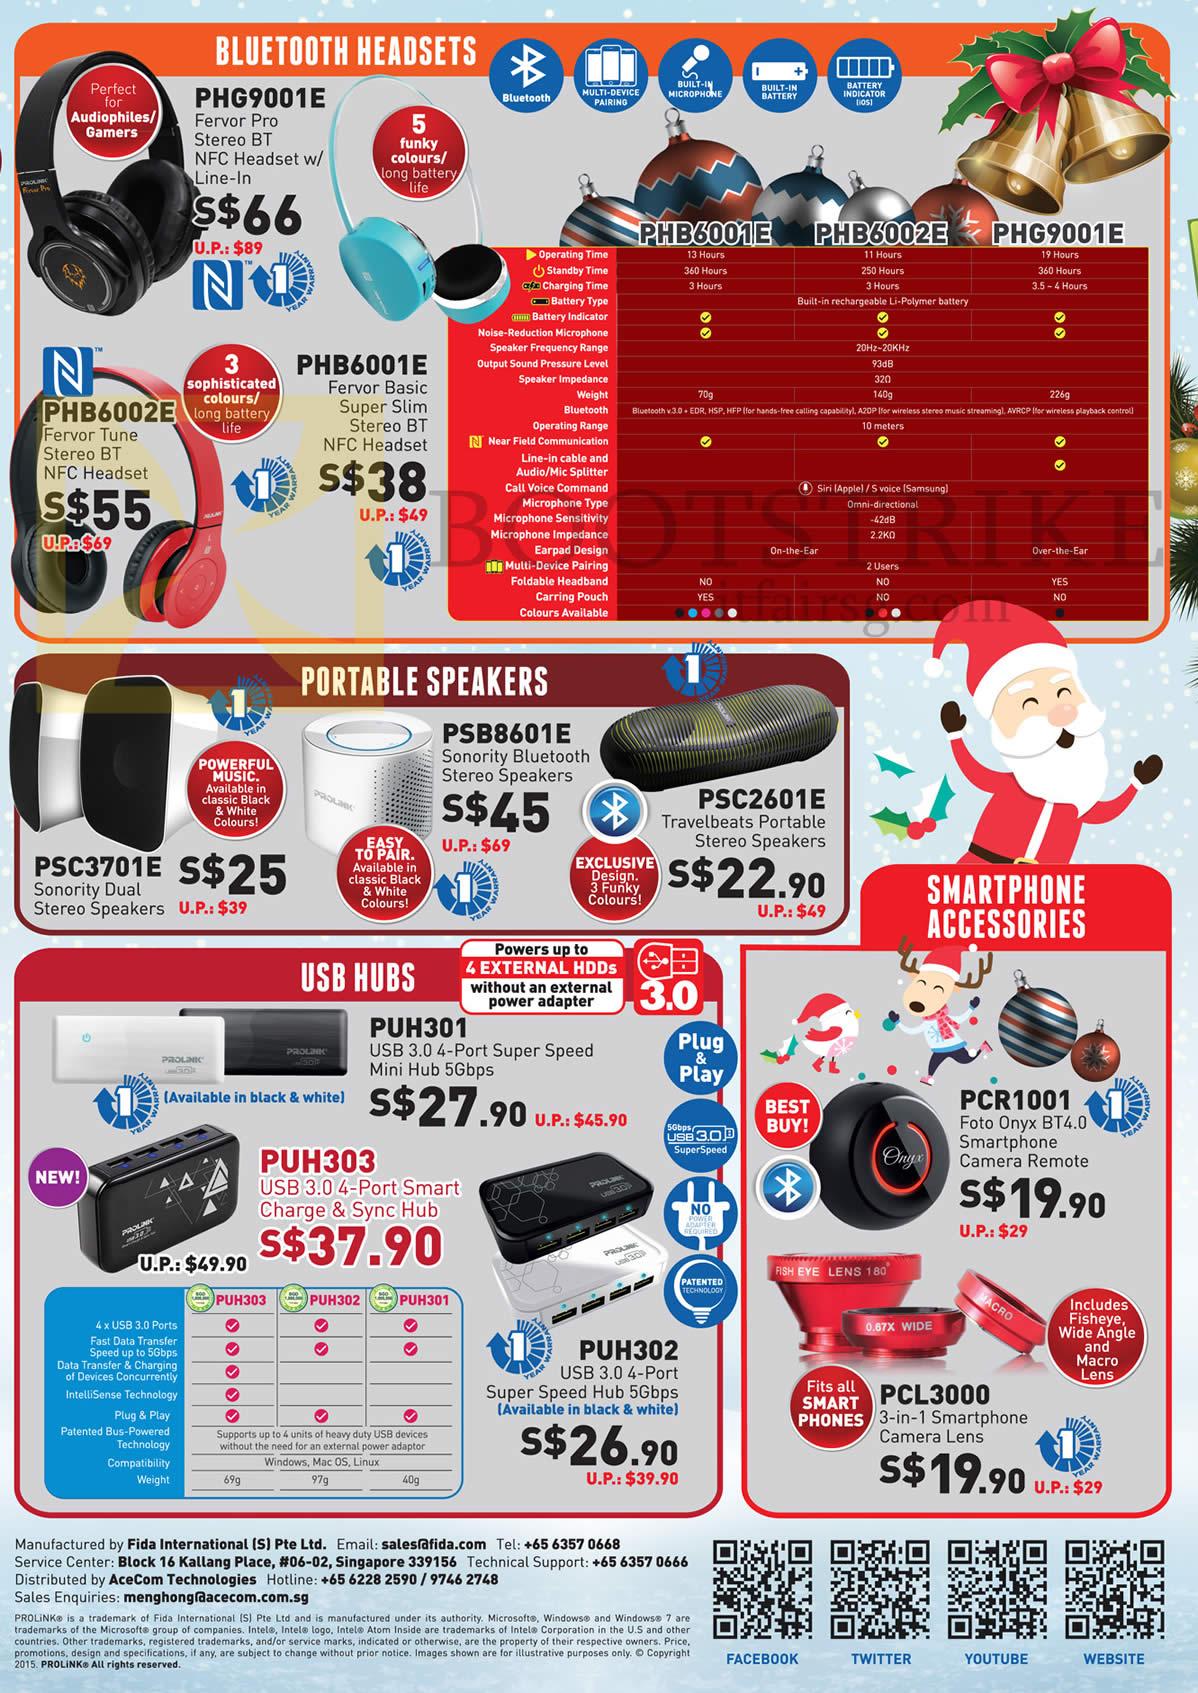 SITEX 2015 price list image brochure of Prolink Bluetooth Headsets, Portable Speakers, USB Hubs, Smartphone Accessories, PHG9001E, PHB6001E, 6002E, PSB8601E, PSC3701E, 2601E